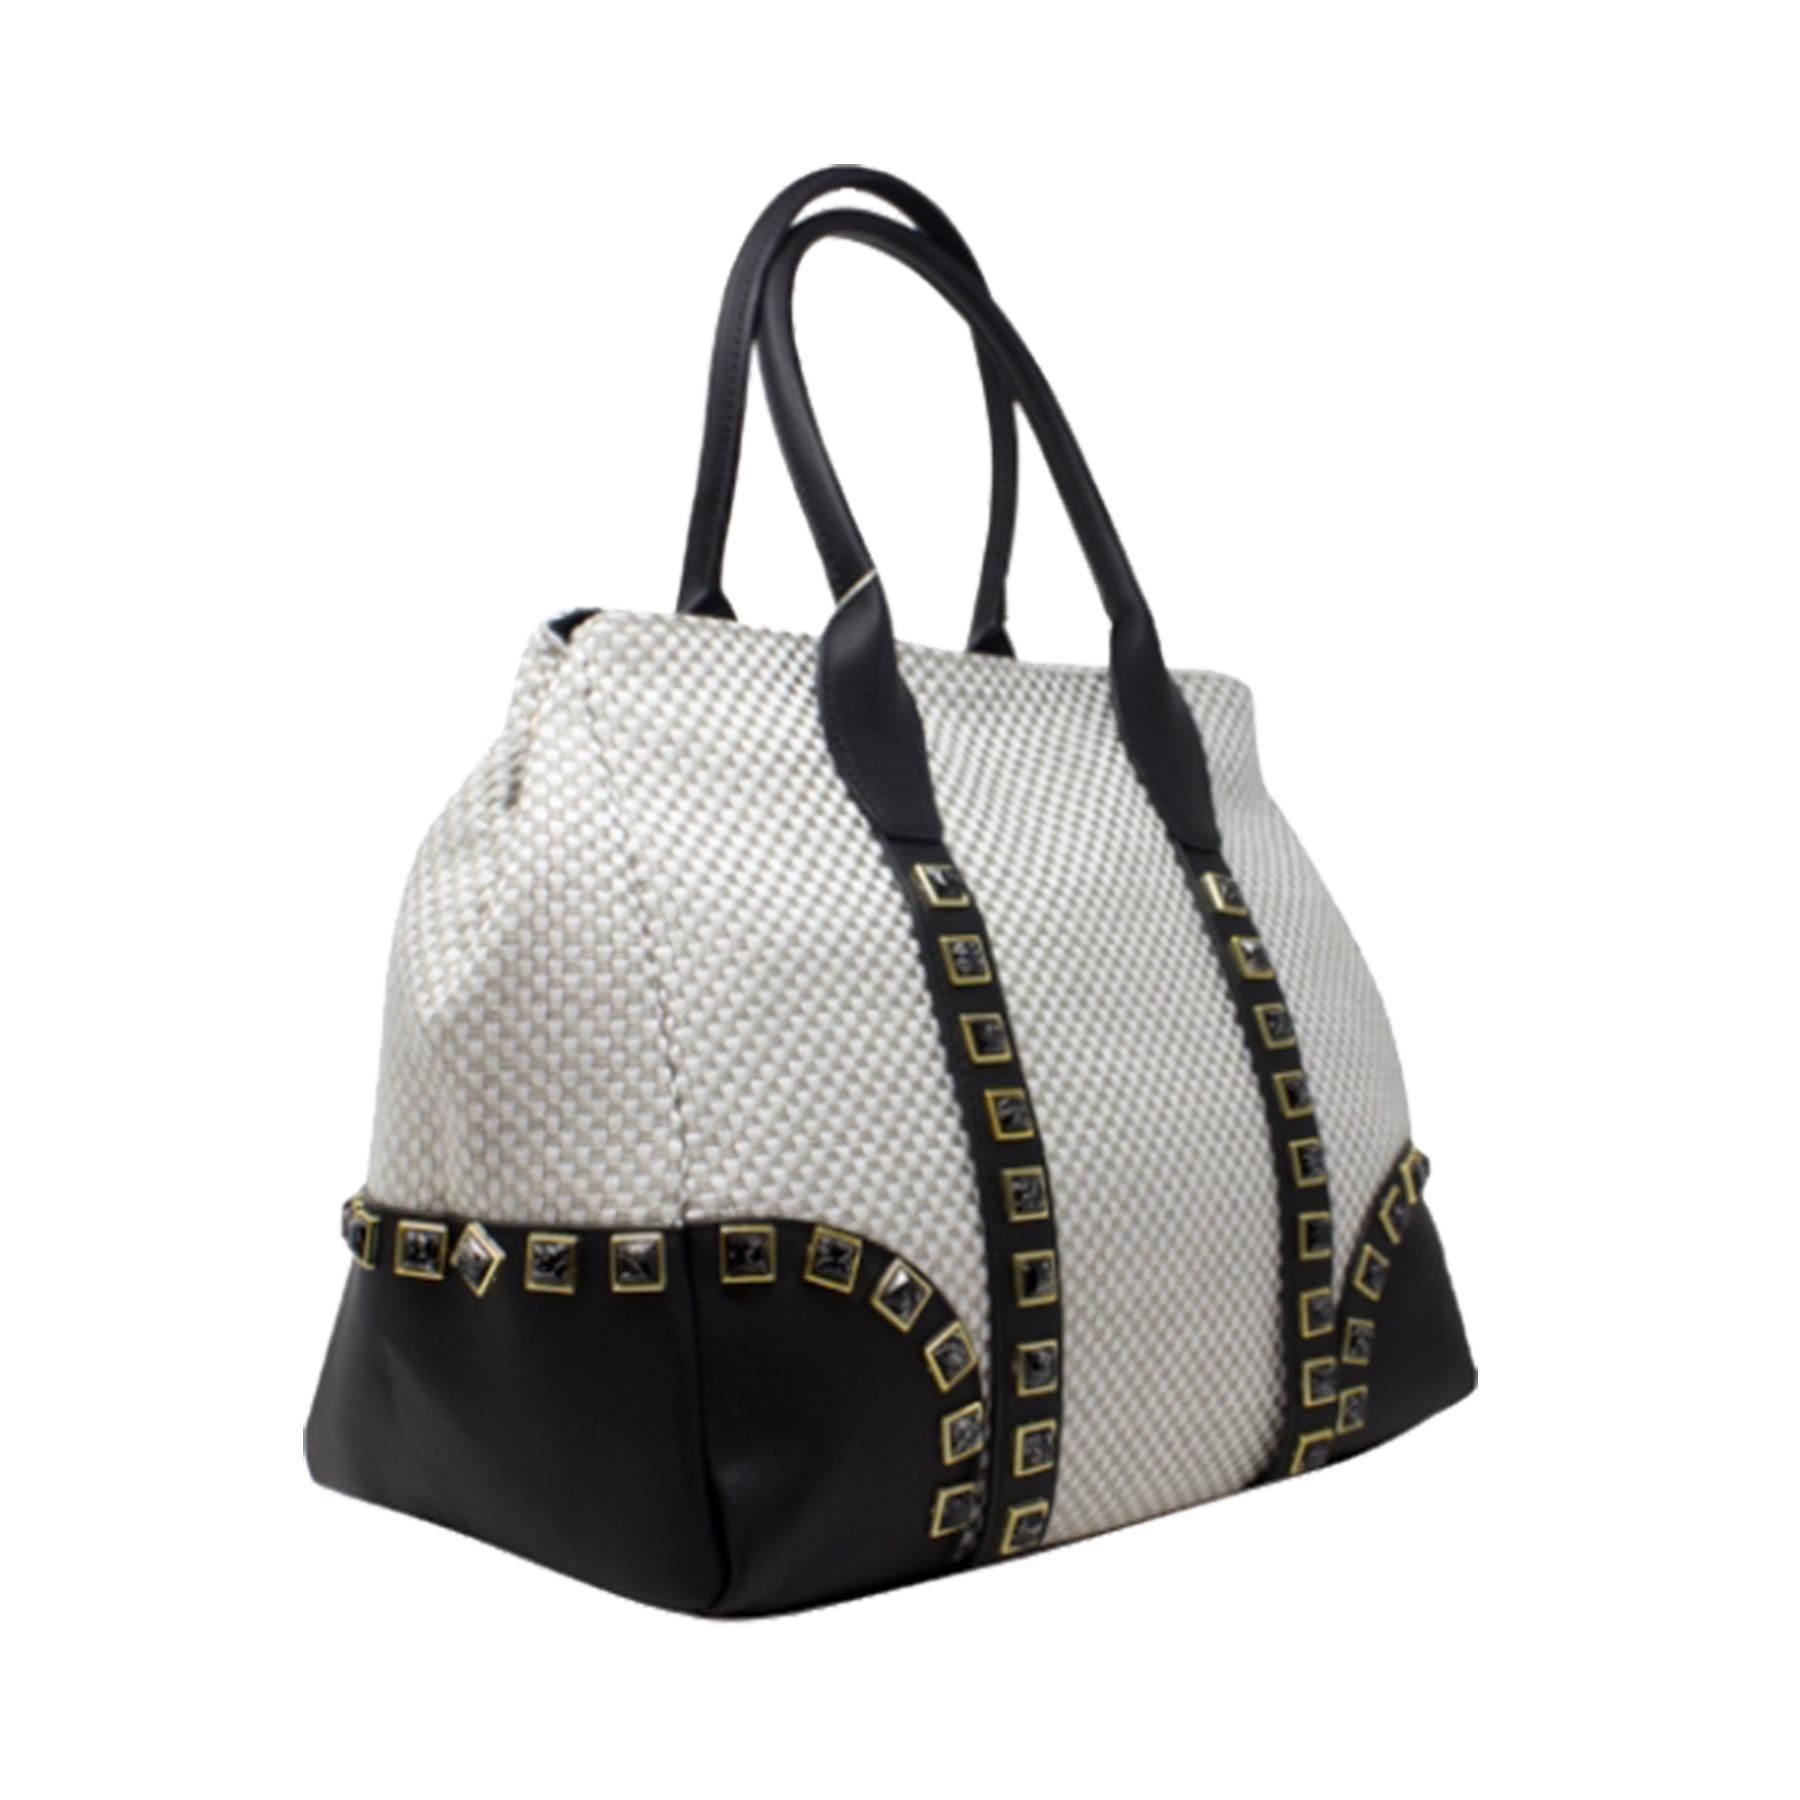 New-Women-s-Small-Check-Pattern-Studded-Design-Tote-Bag-Handbag thumbnail 13